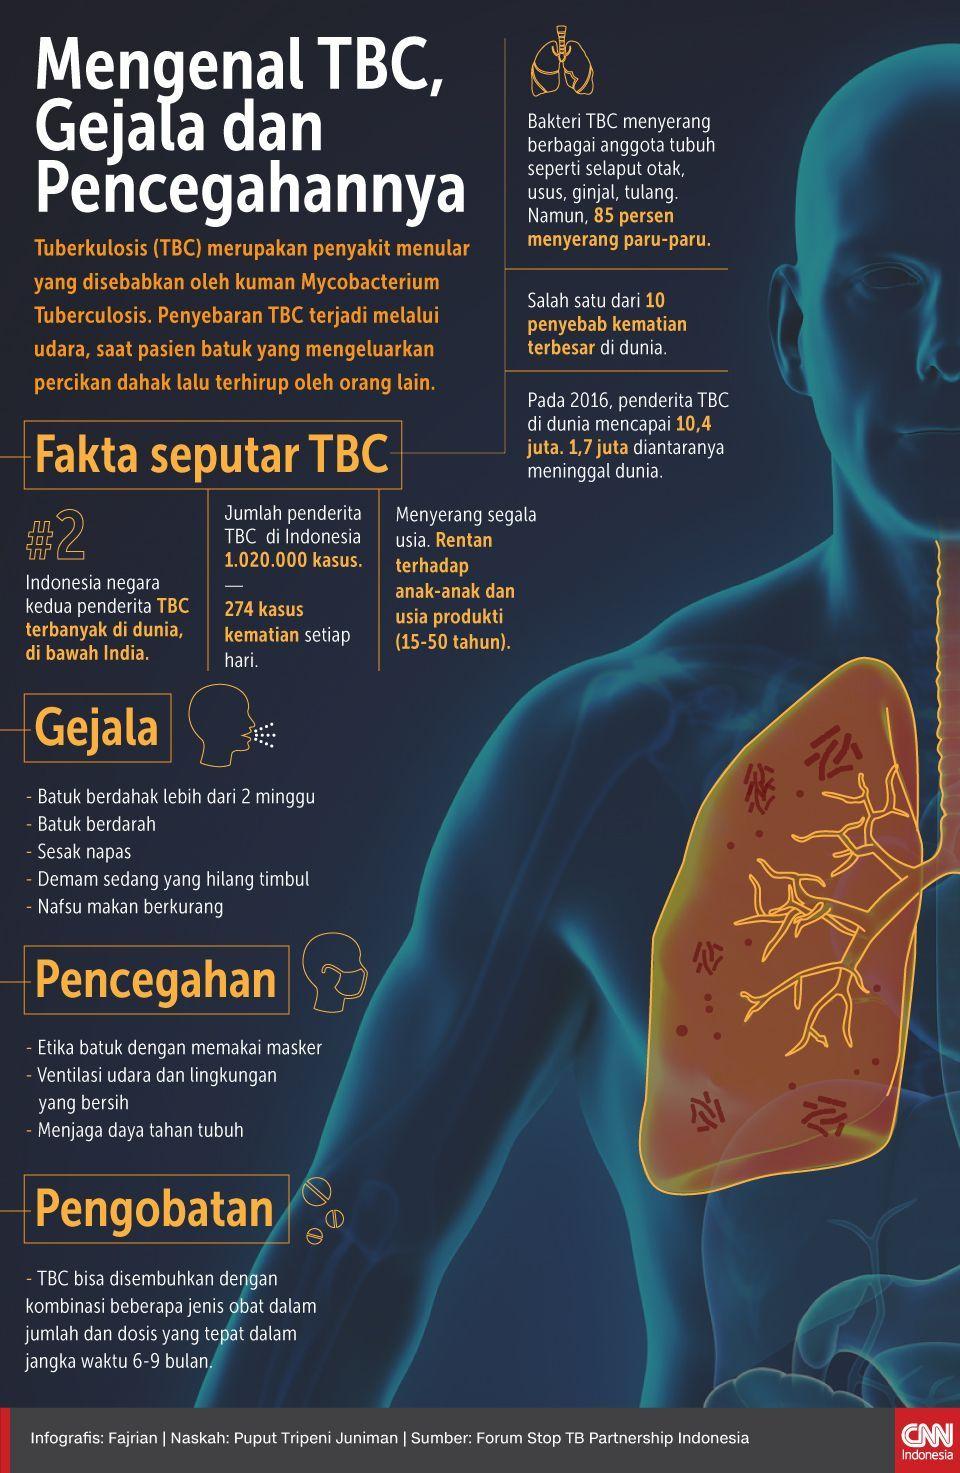 Infografis Mengenal TBC Gejala dan Pencegahannya